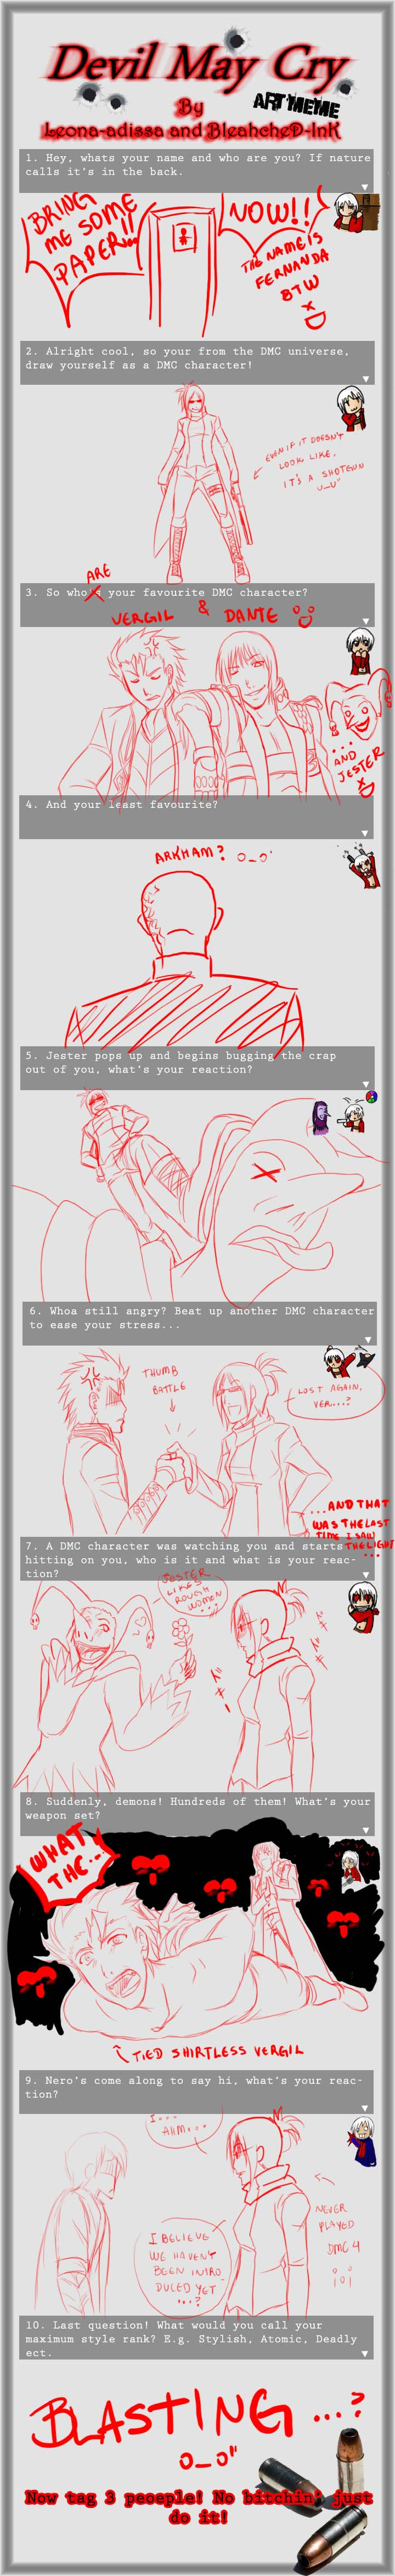 Devil May Cry meme by fer-nanda-ssk